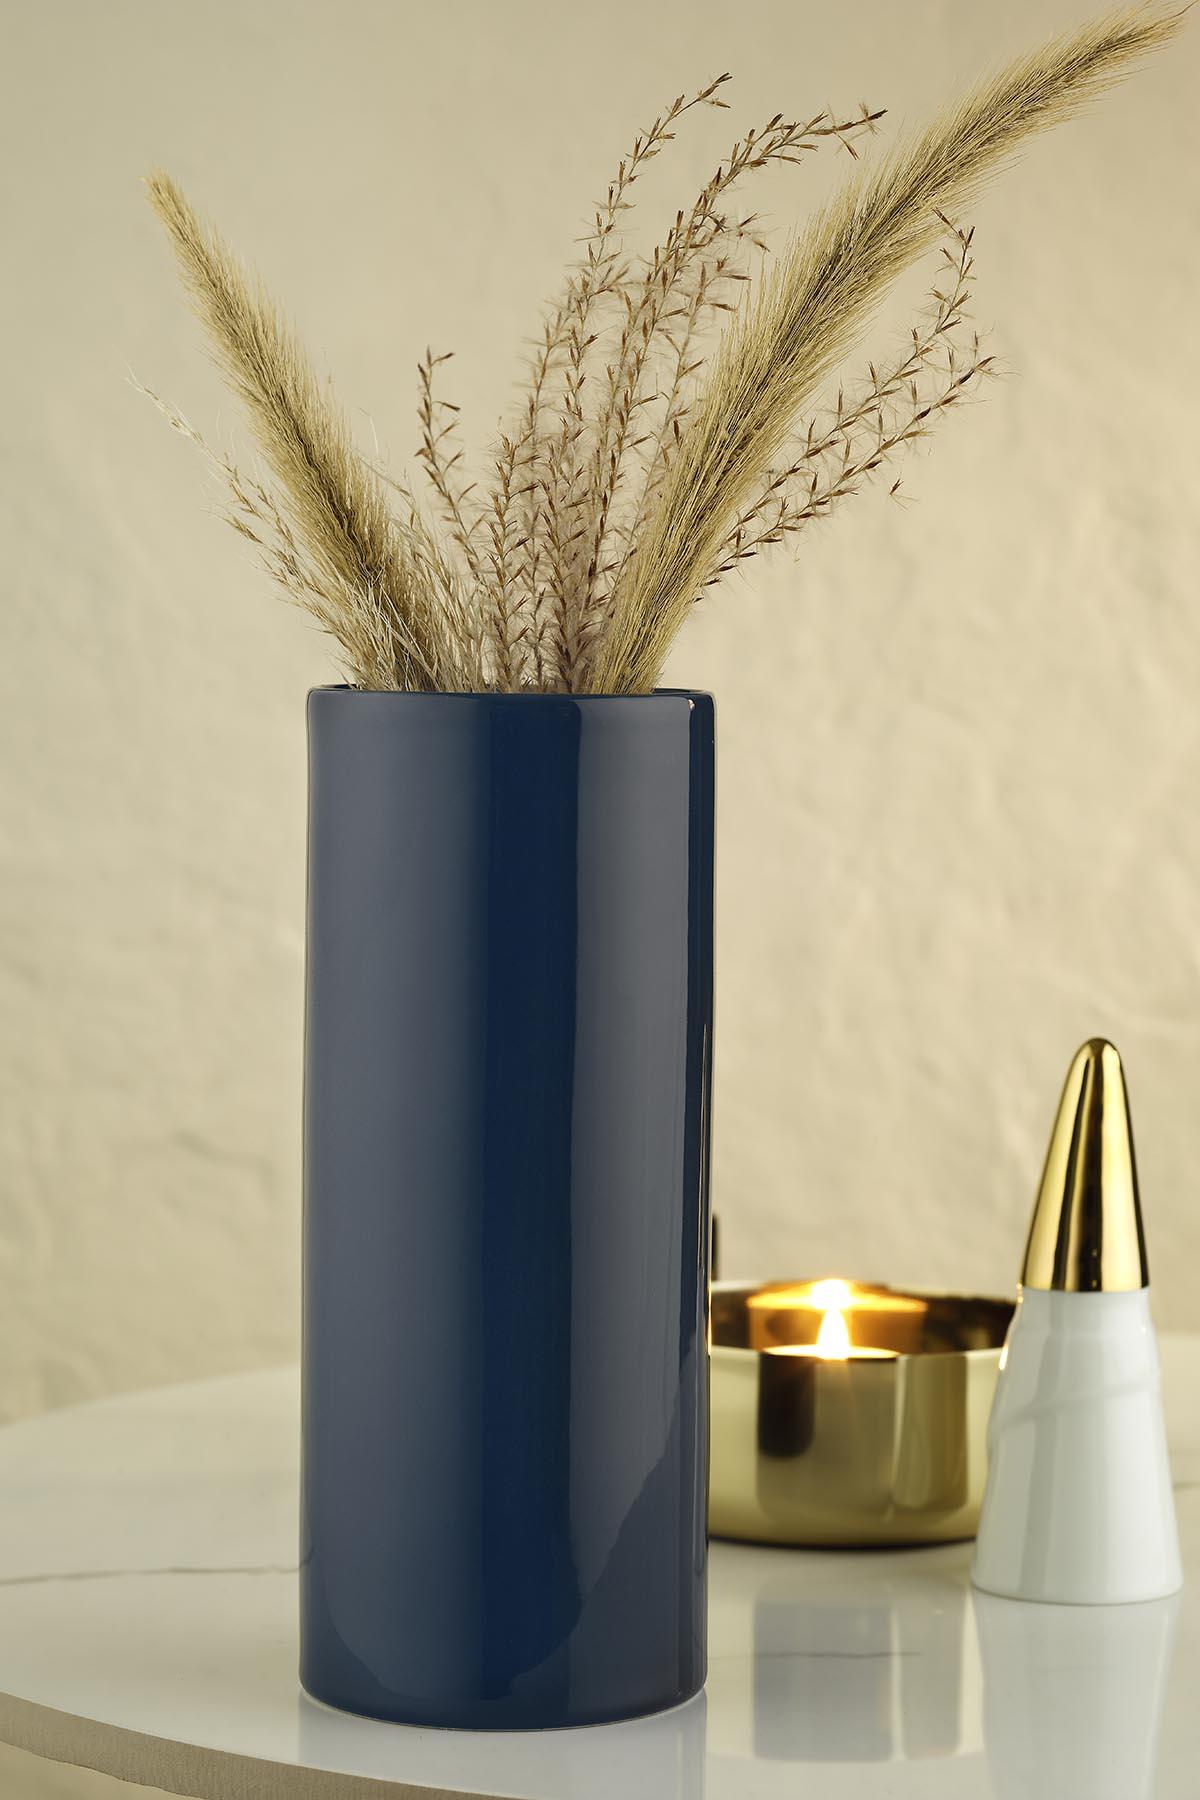 Kütahya Porselen Modern 20 cm Vazo Lacivert